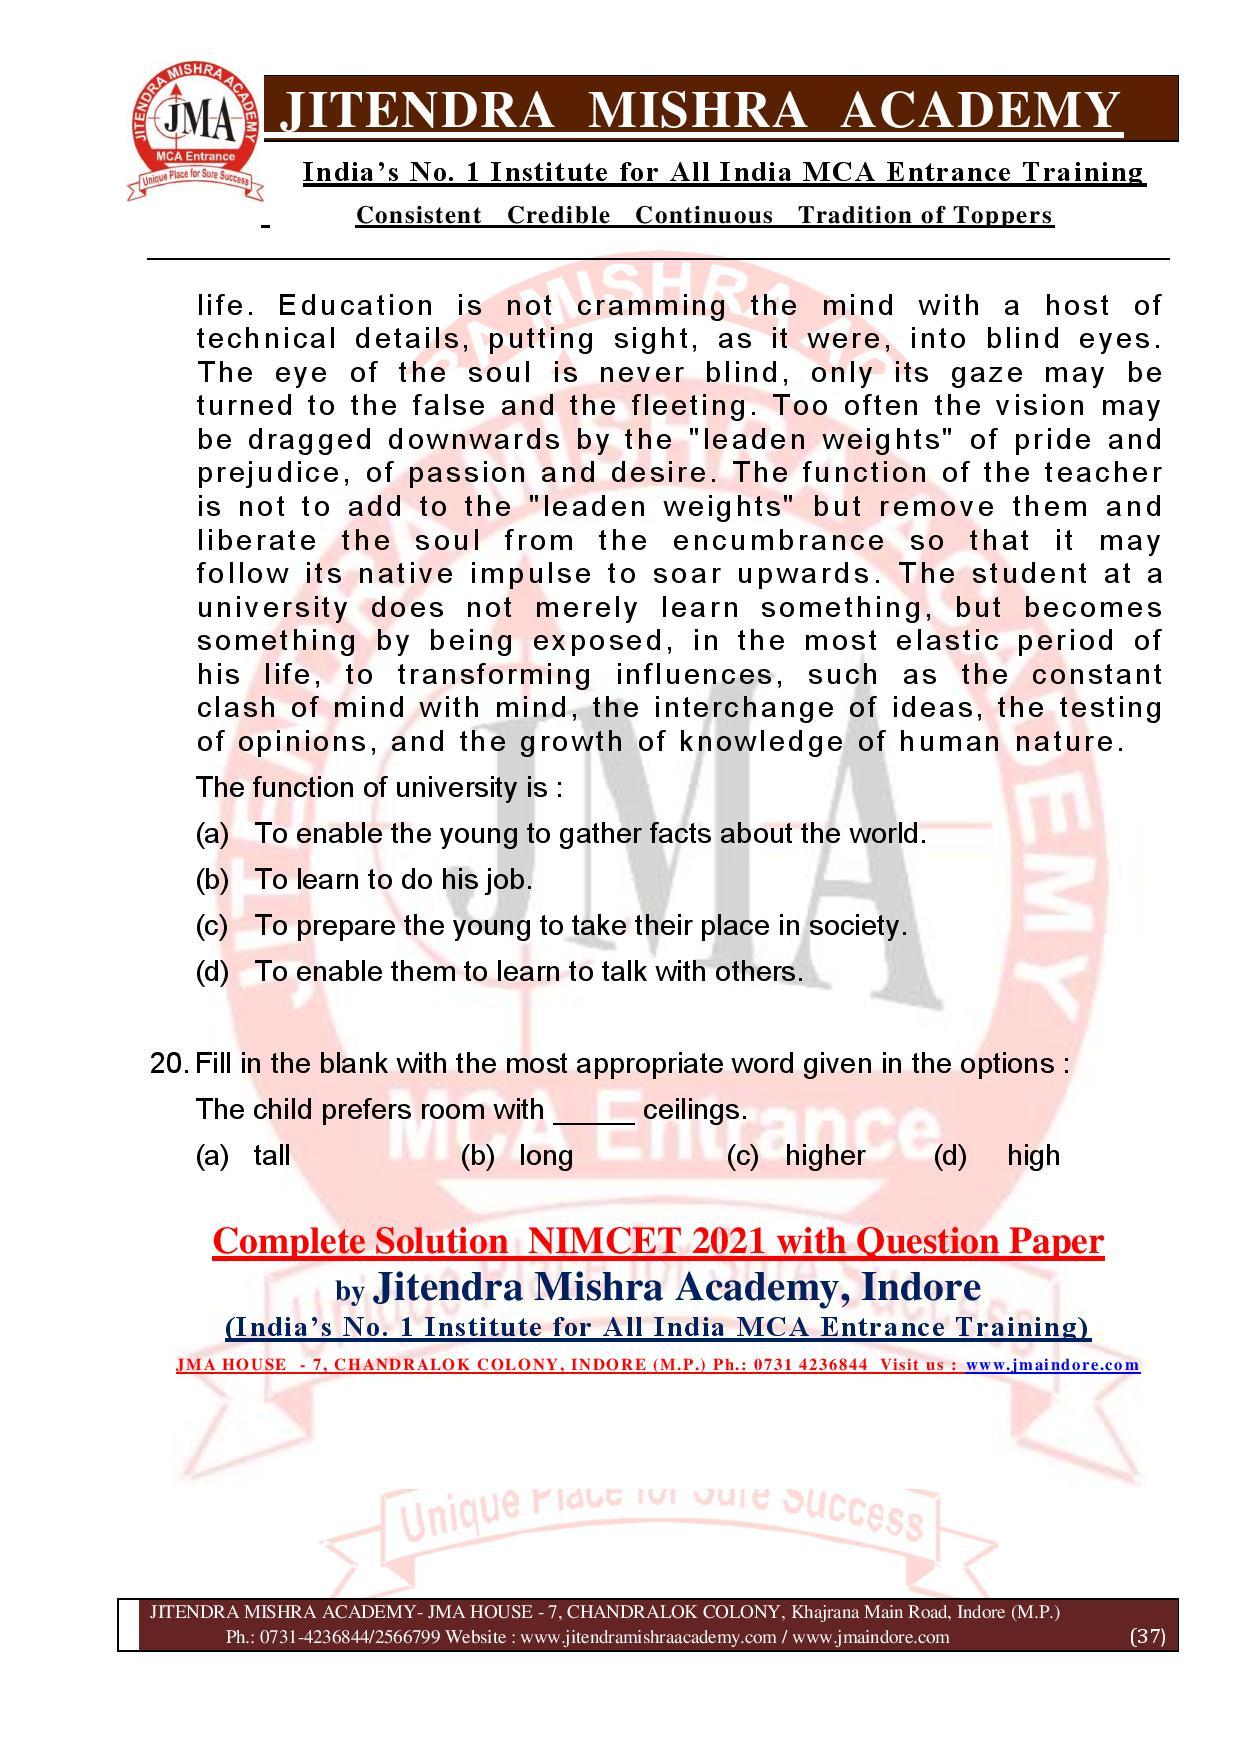 NIMCET 2021 QUESTION PAPER (F)-page-037